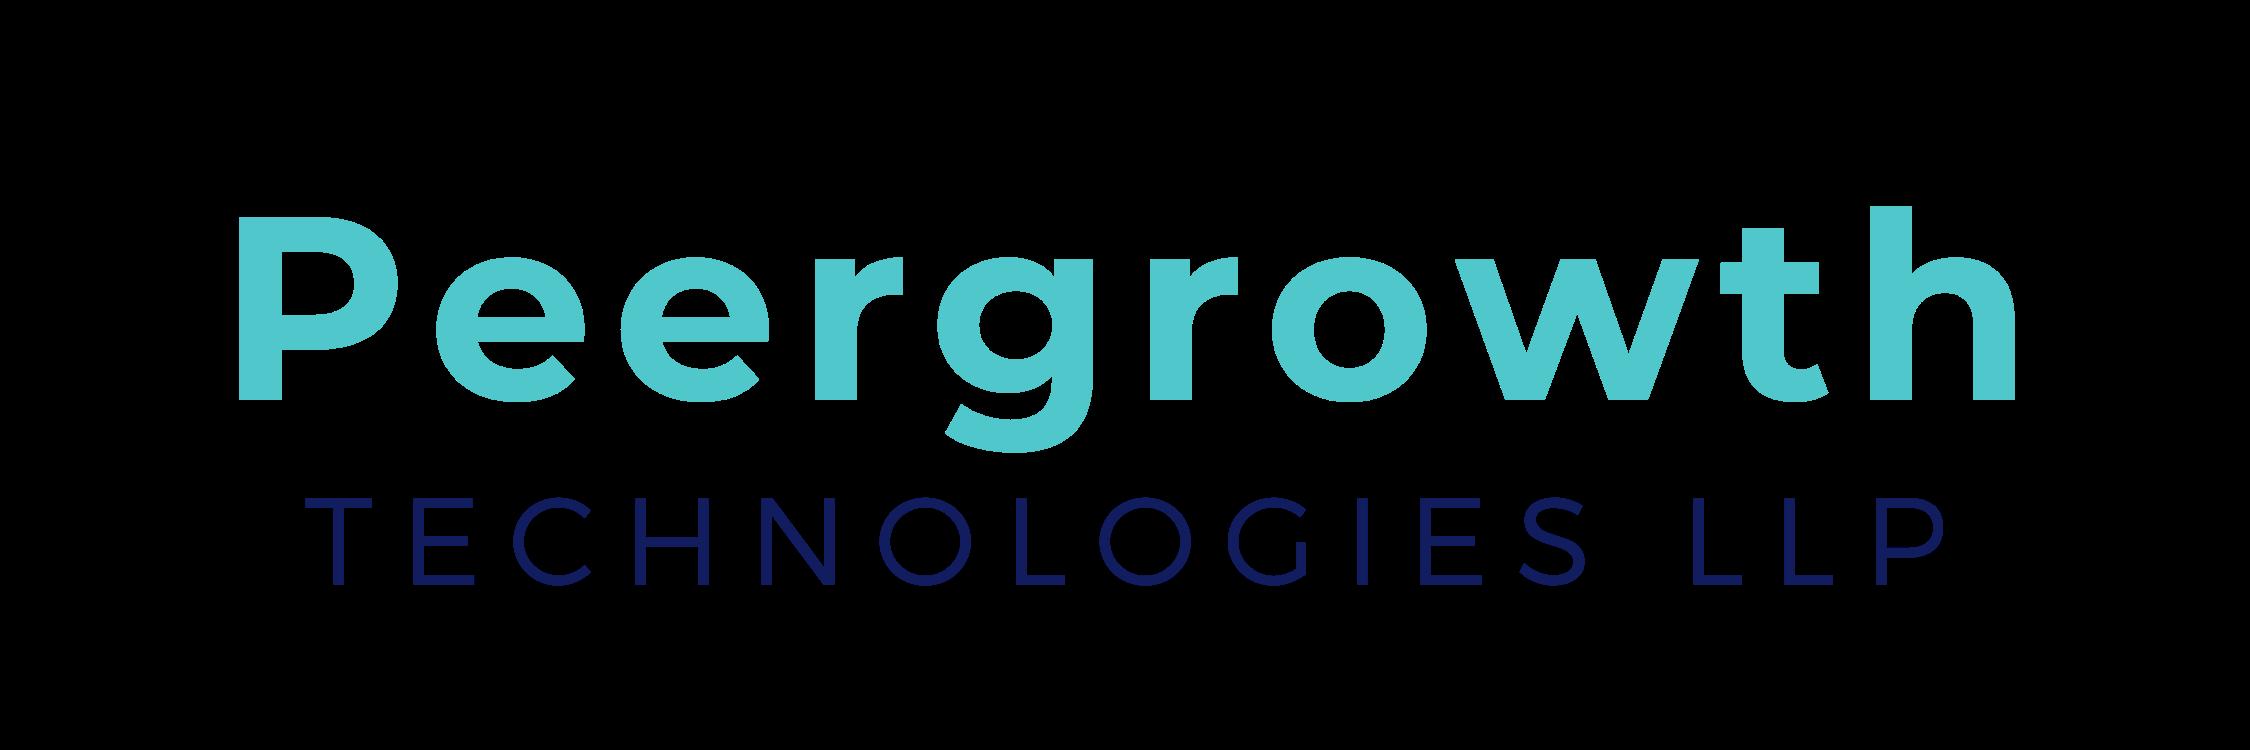 Peergrowth Technologies